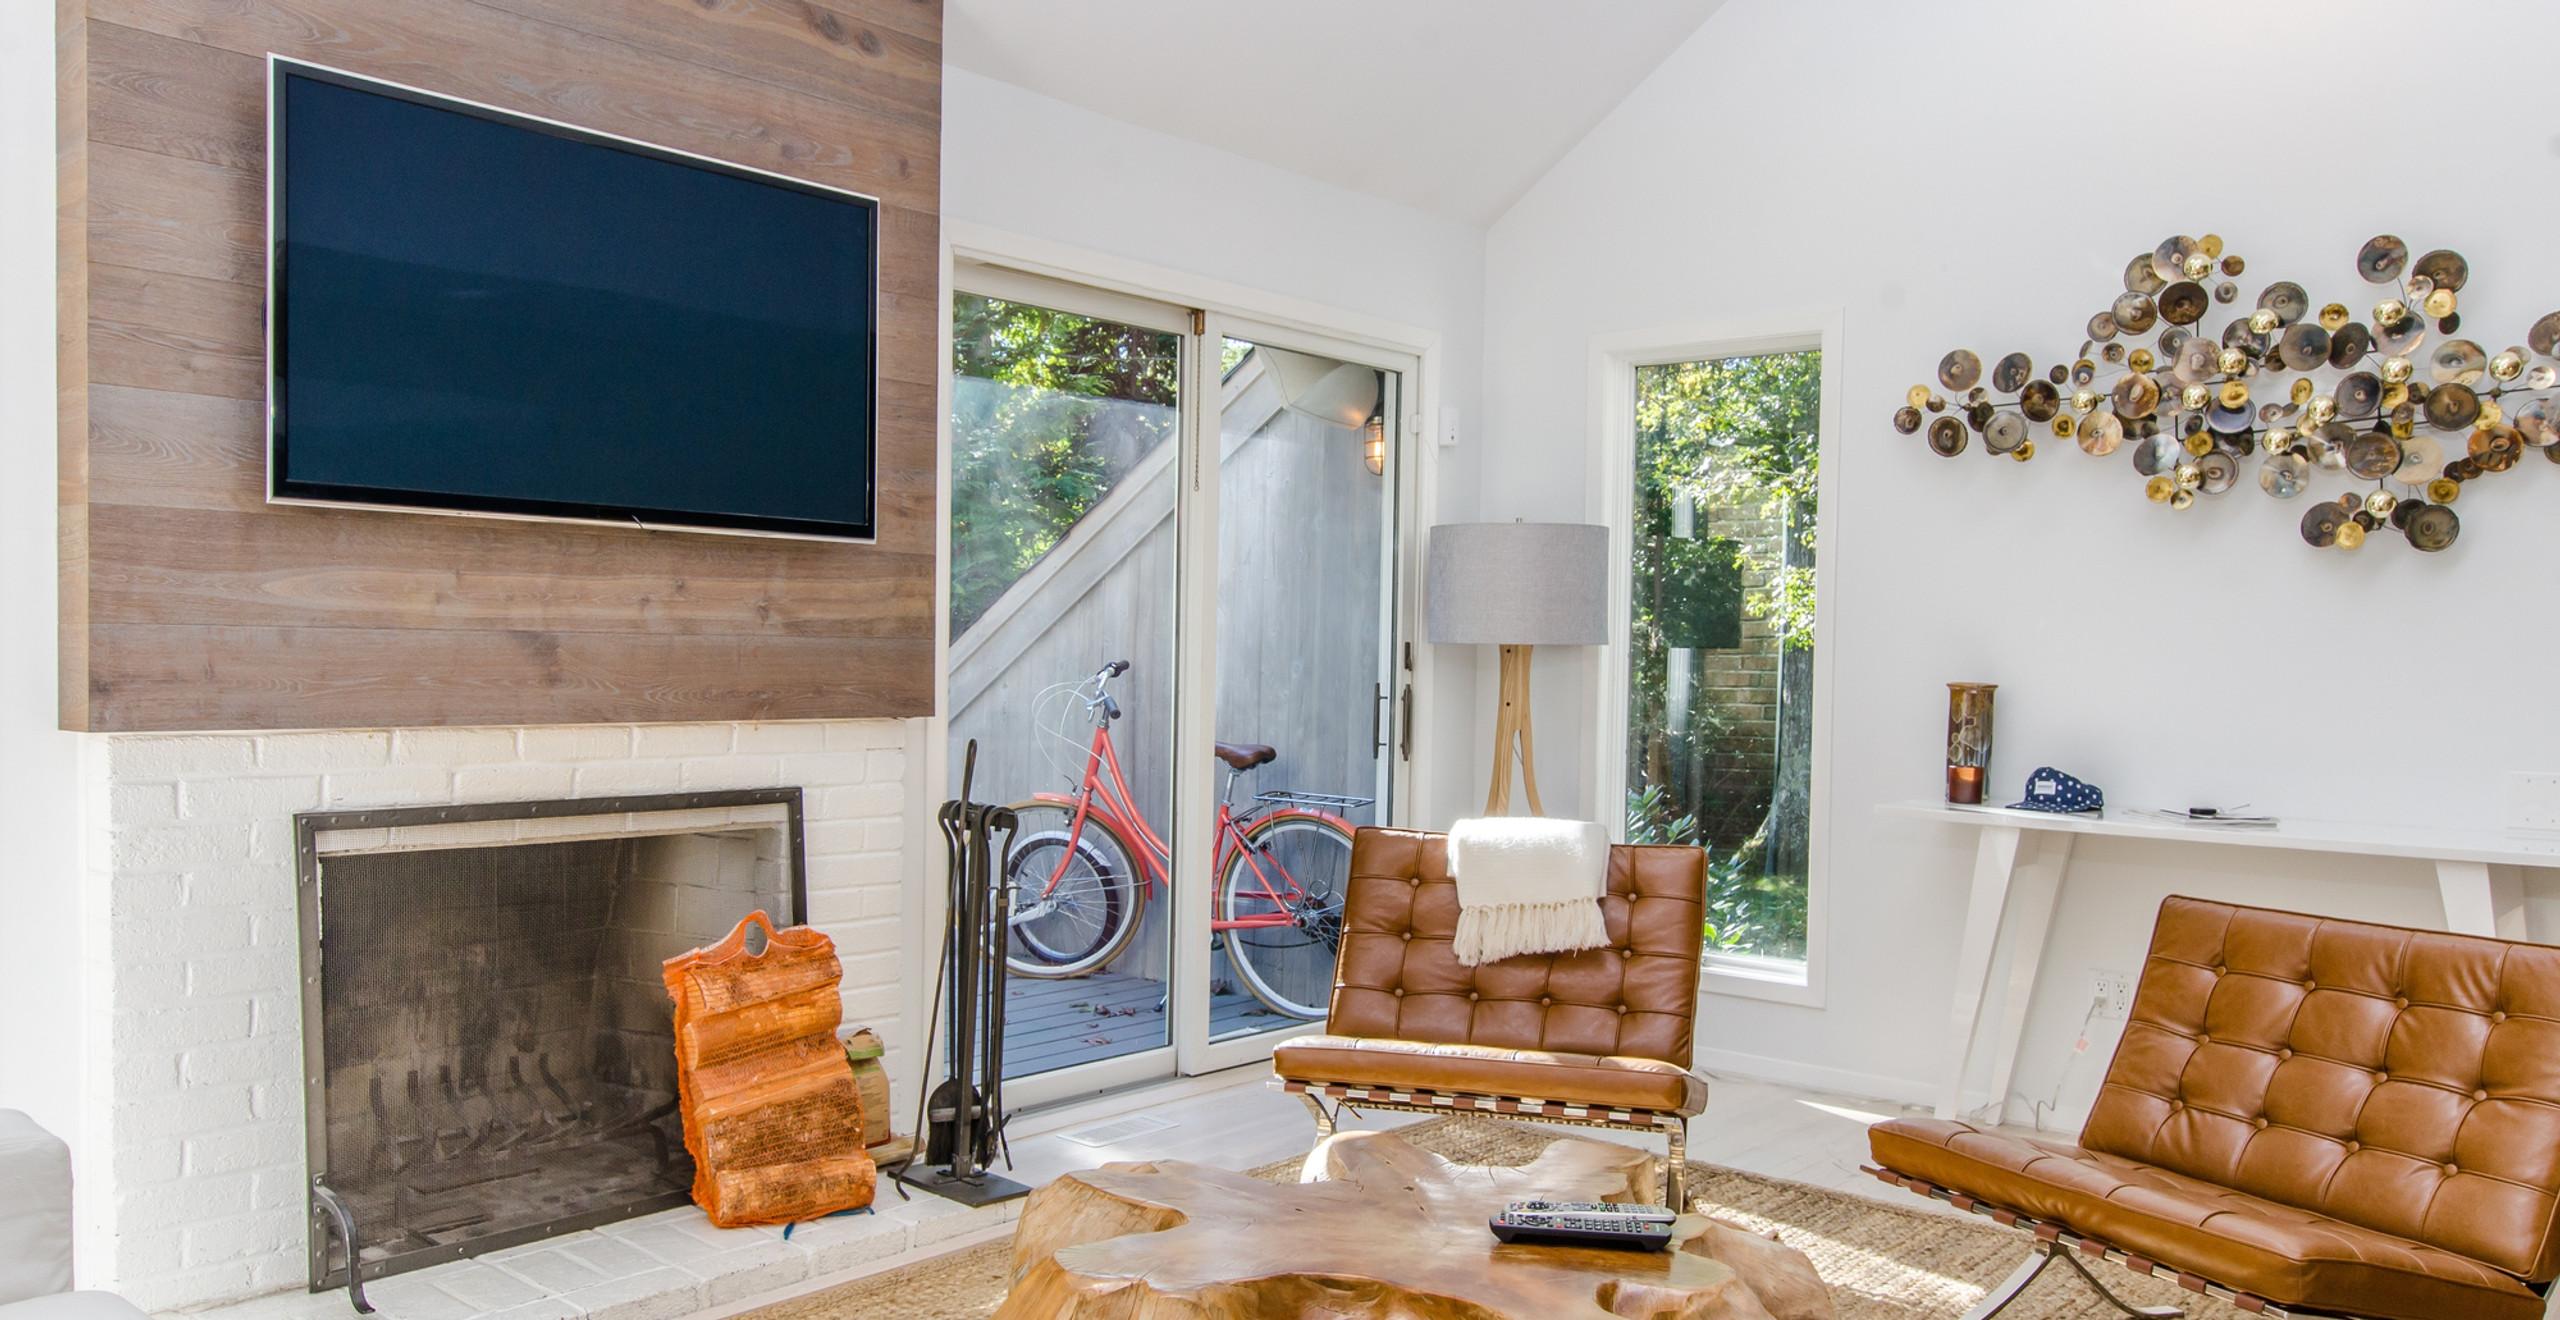 Cozy living room fireplace